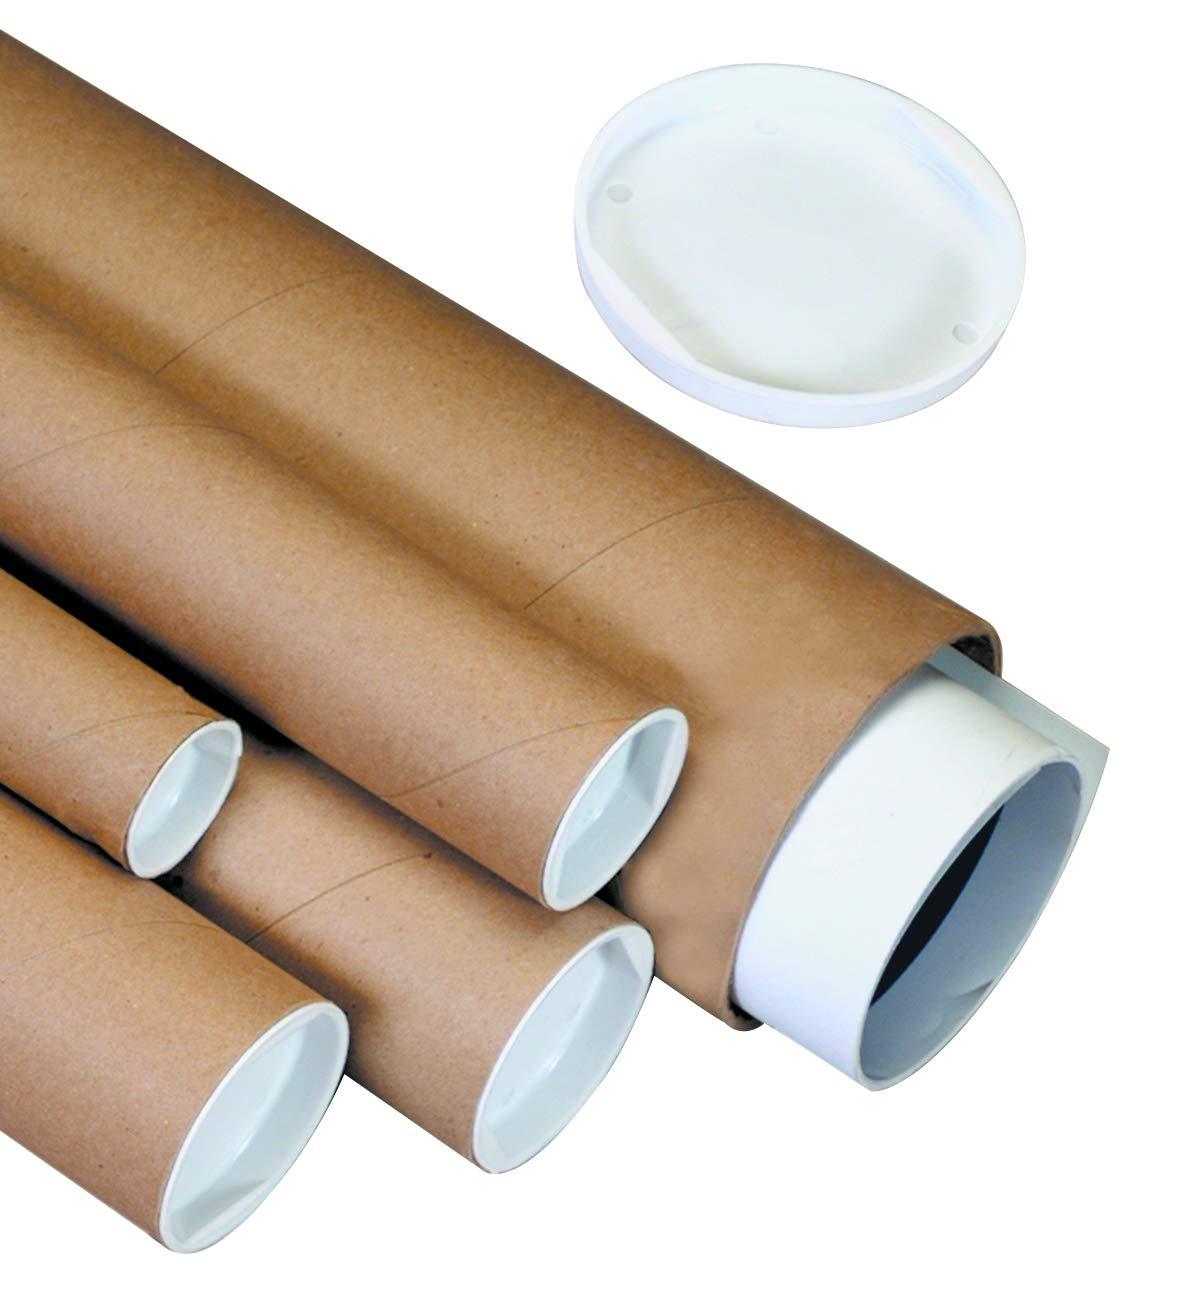 Aviditi P2022K Mailing Tubes with Caps, 2'' x 22'', Kraft (Pack of 50) by Aviditi